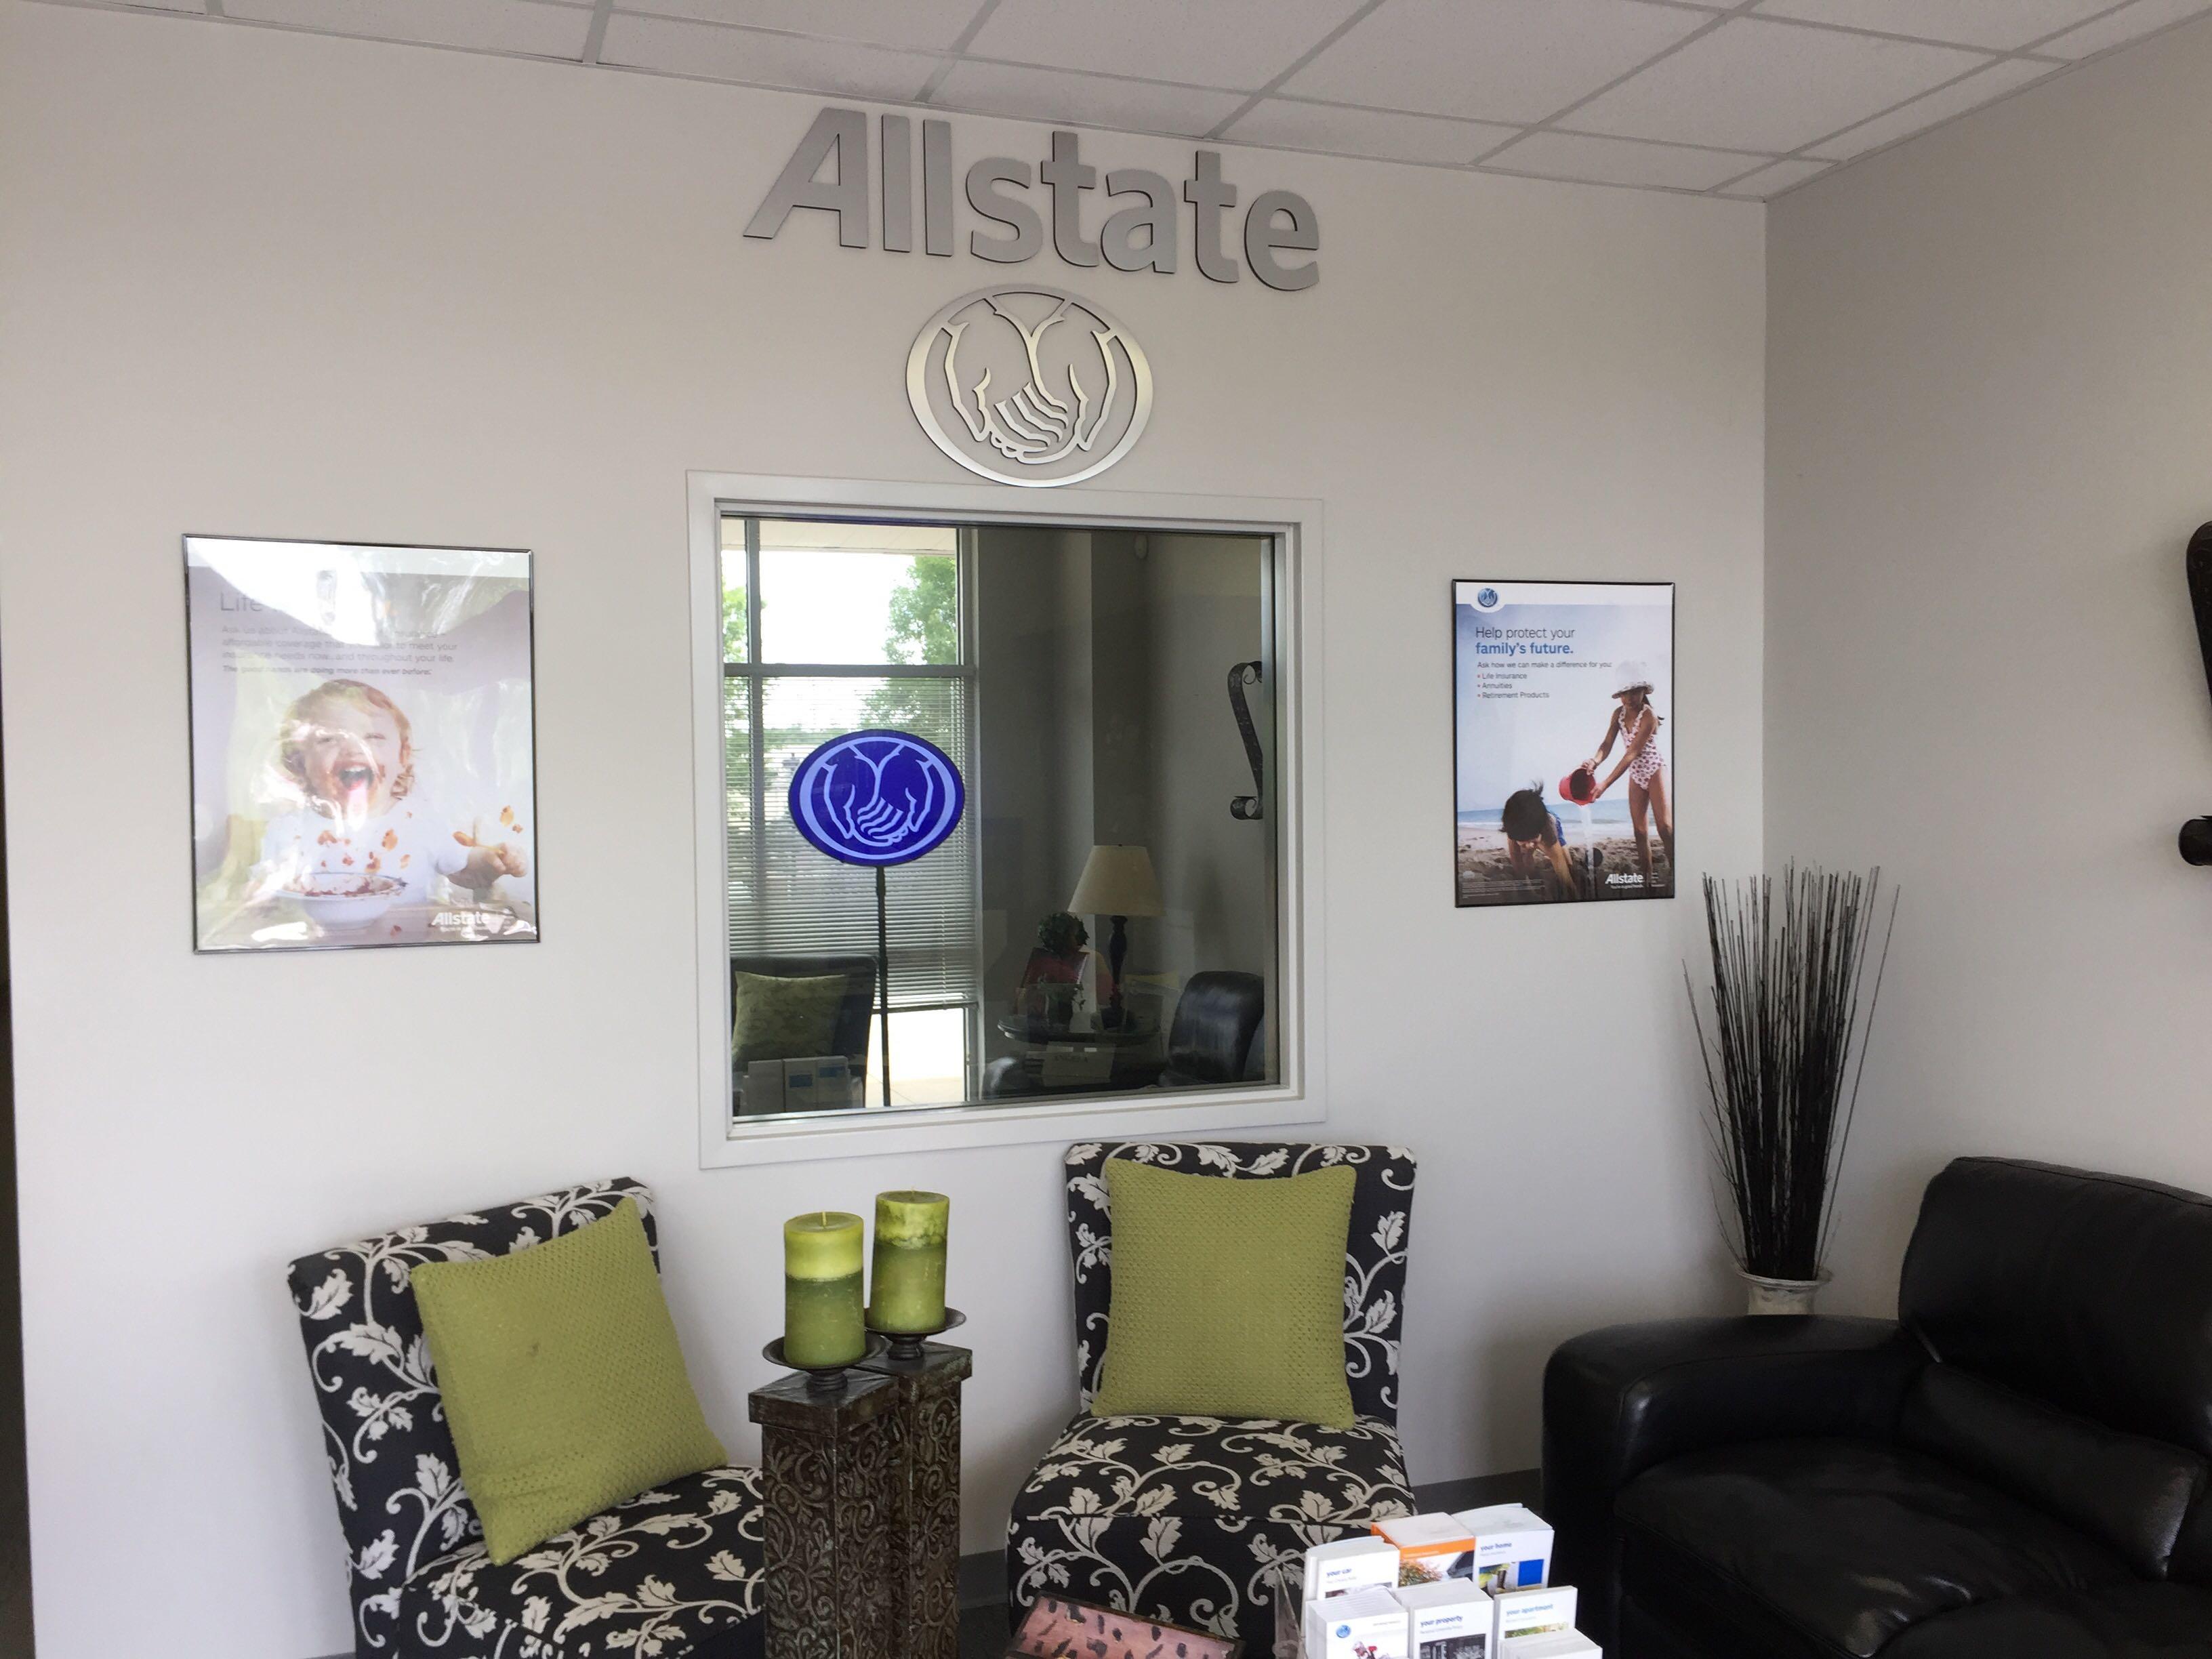 C. Kelly Davidson: Allstate Insurance image 0